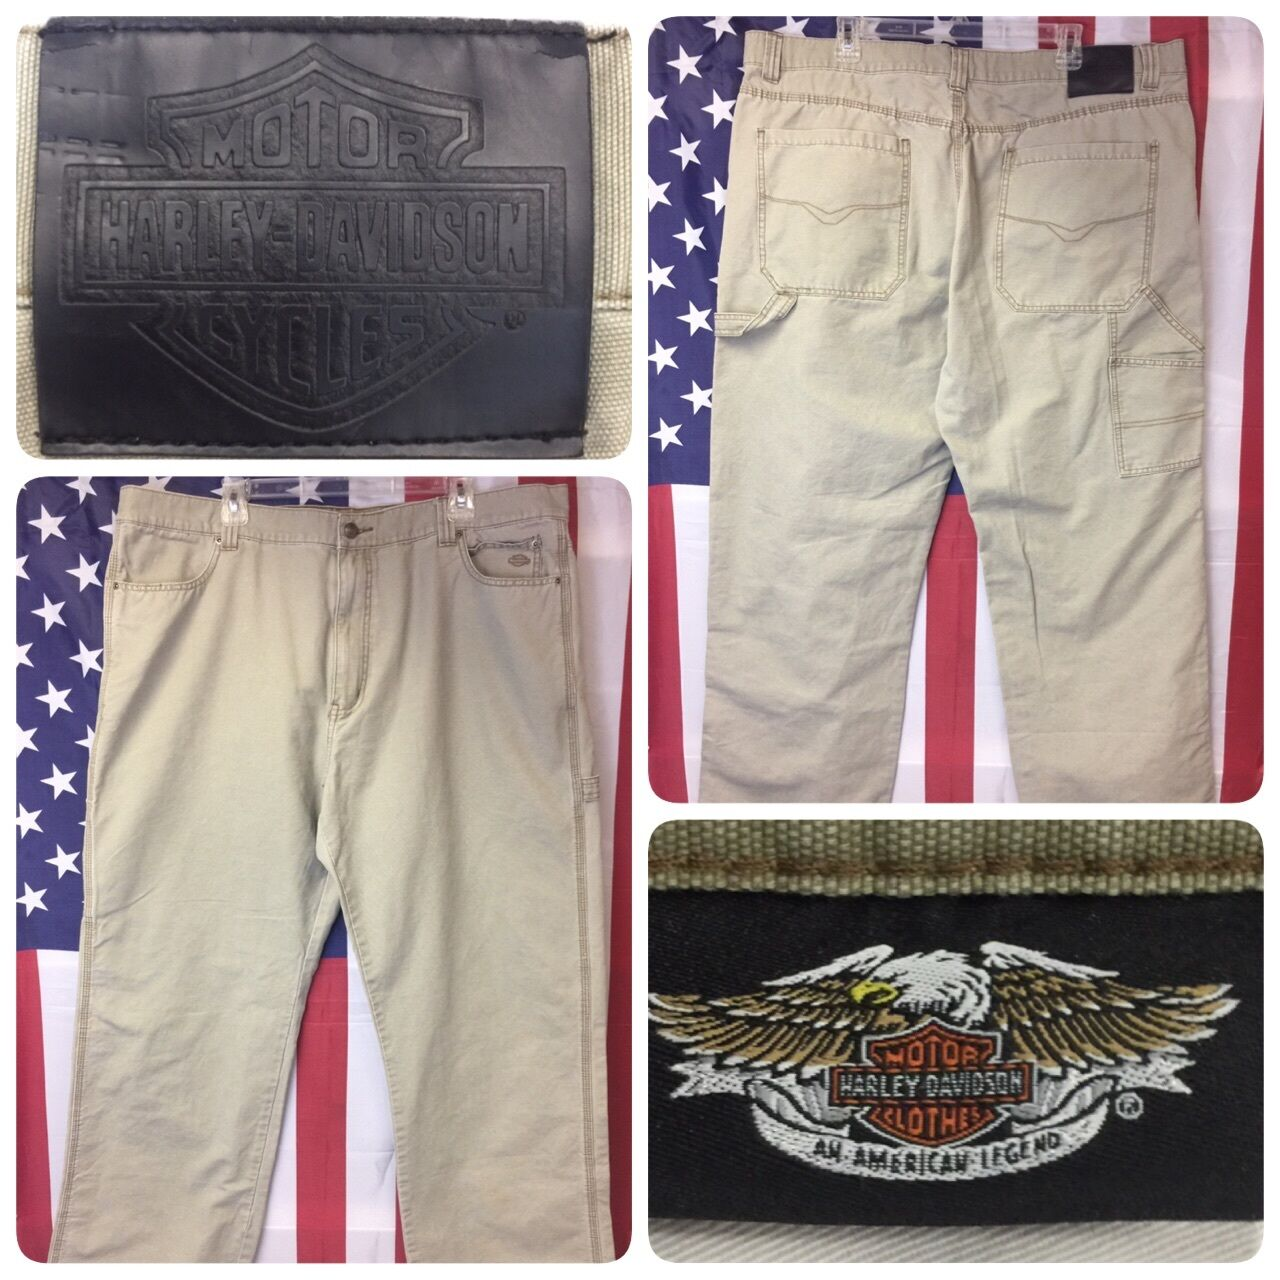 Harley-Davidson Men's Carpenter Pants BIG size 44x34 Khaki Canvas